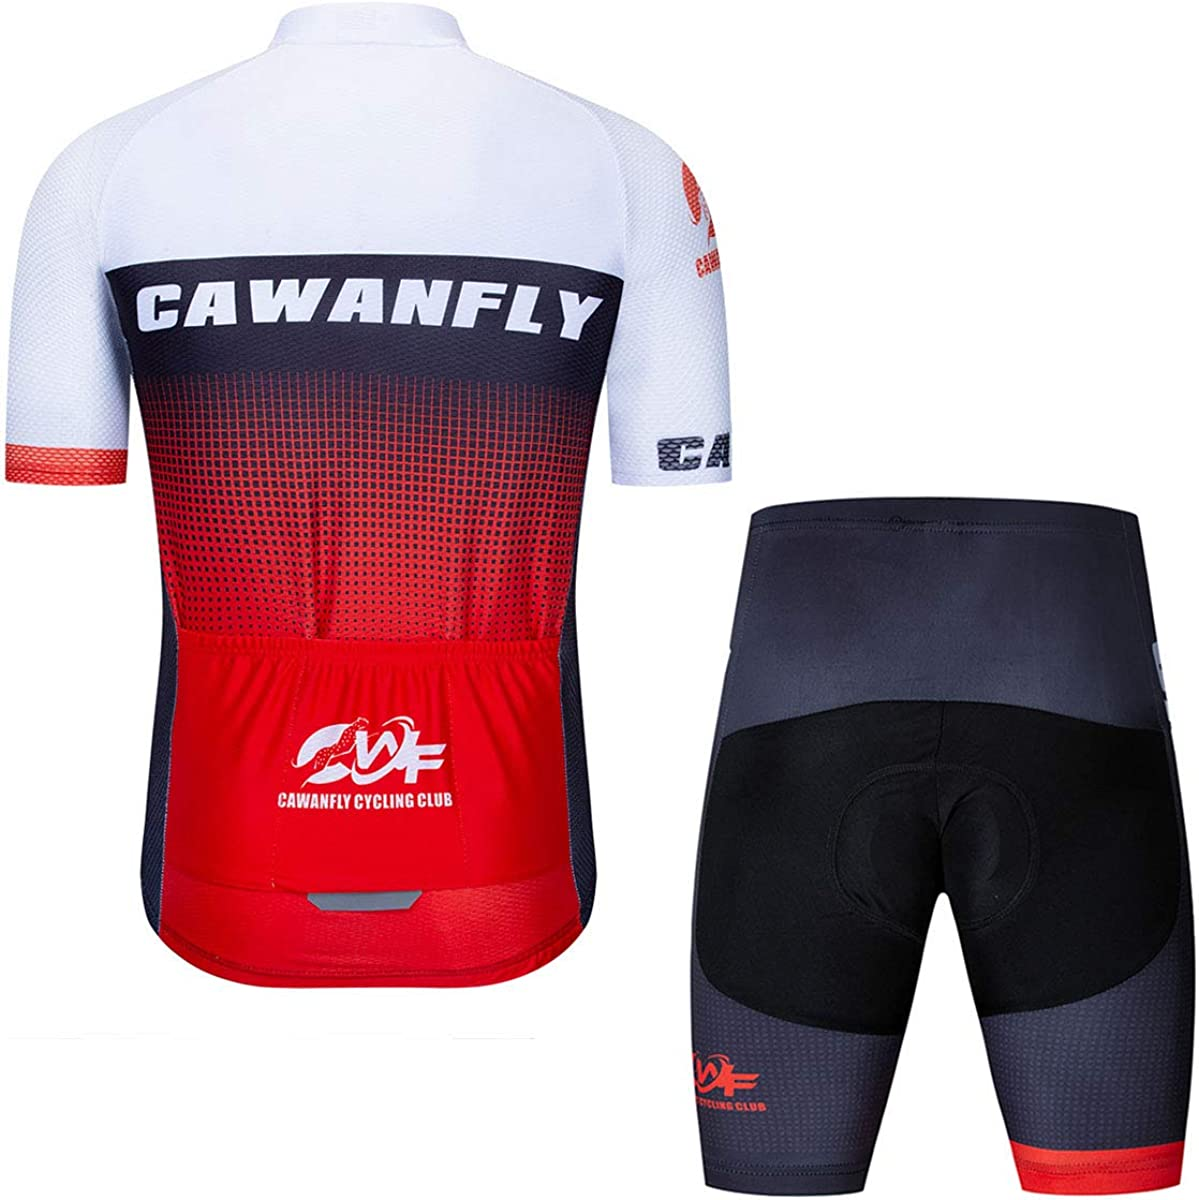 Men Cycling Outfit Set MTB Road Bike Cycling Clothing Short Sleeve Biking Shirt Compression Bike Shorts